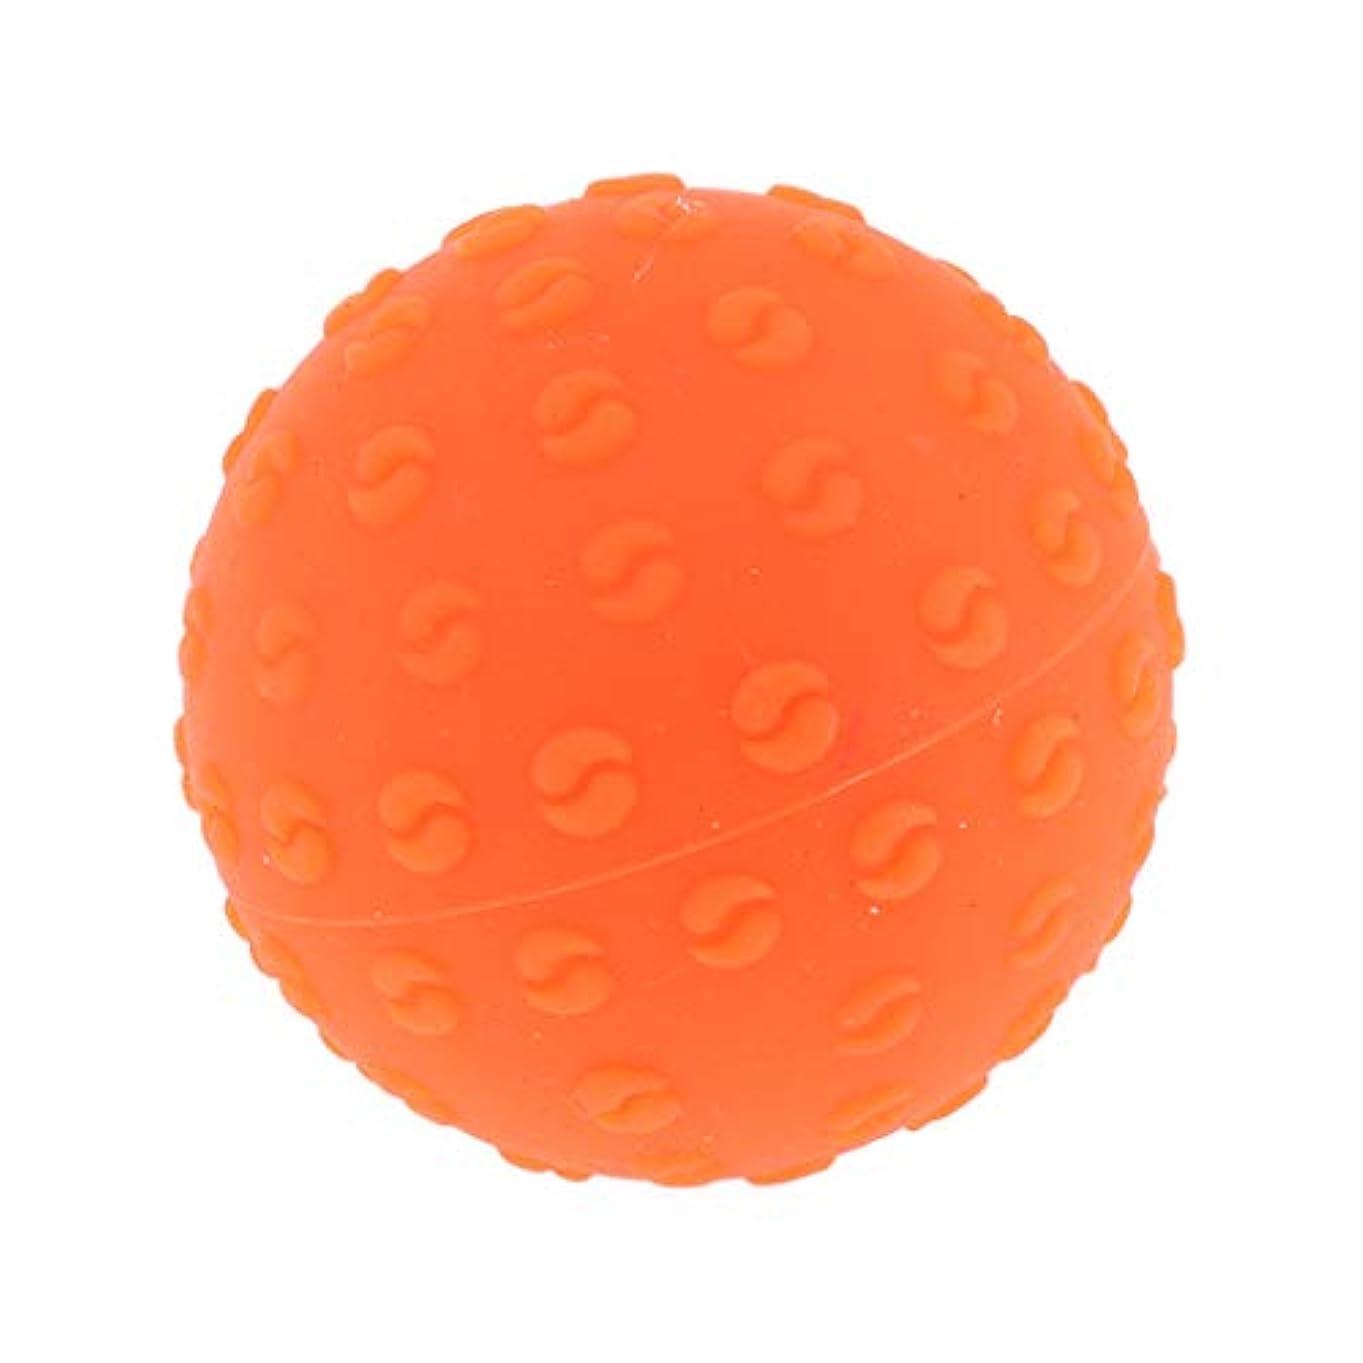 FLAMEER 全6色 シリコーンマッサージボール 指圧ボール トリガーポイント ヨガ 肩、足、首、腕 解消 耐摩耗 - オレンジ, 説明のとおり